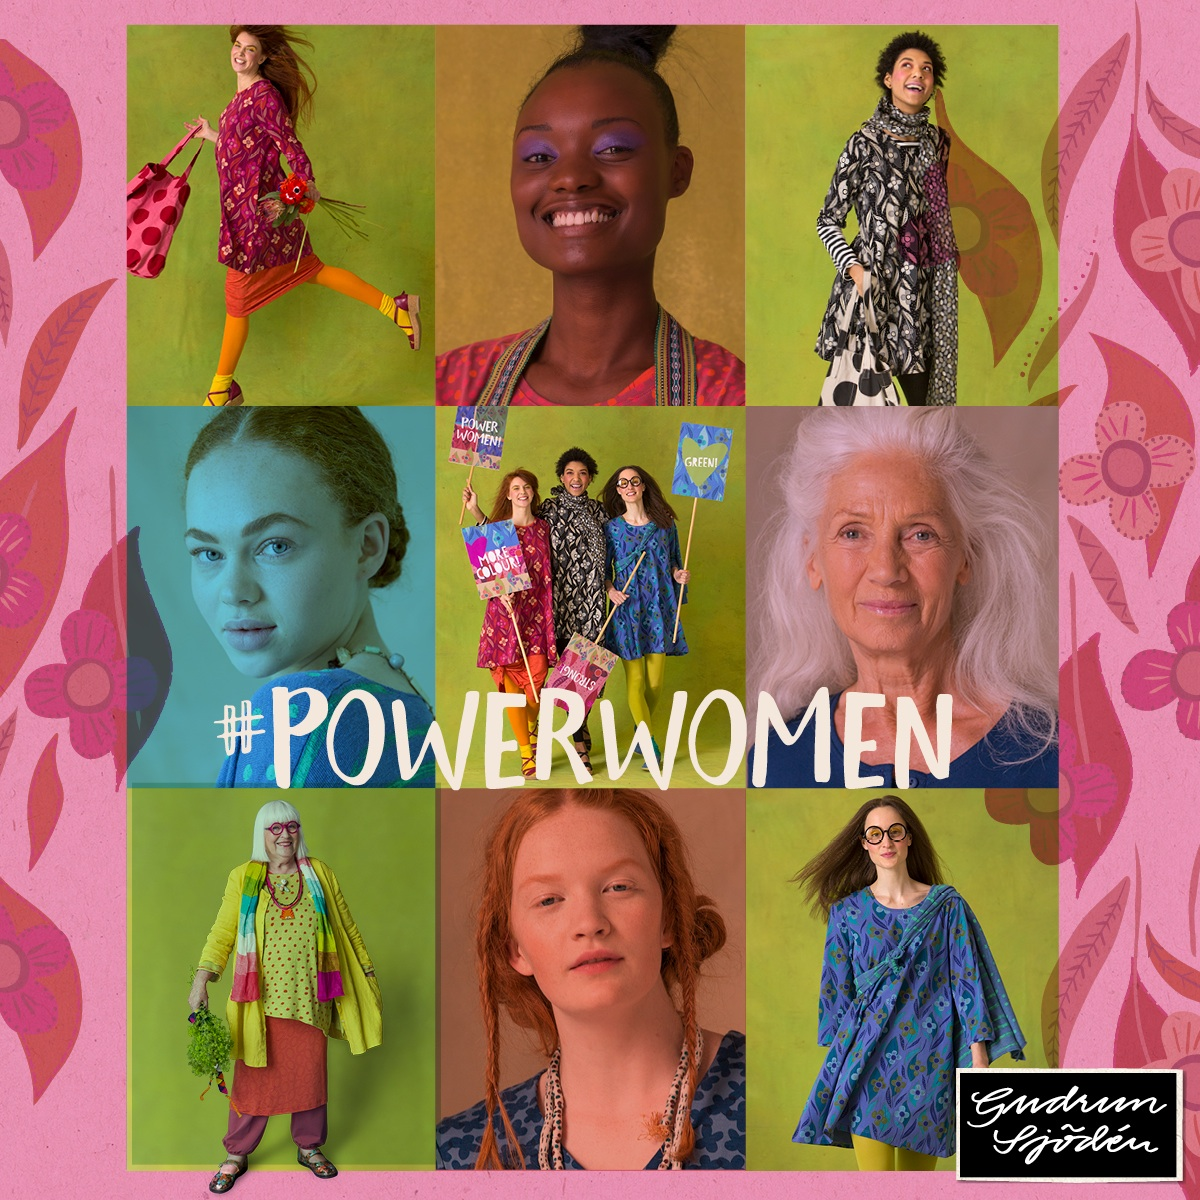 powerwomen.jpg